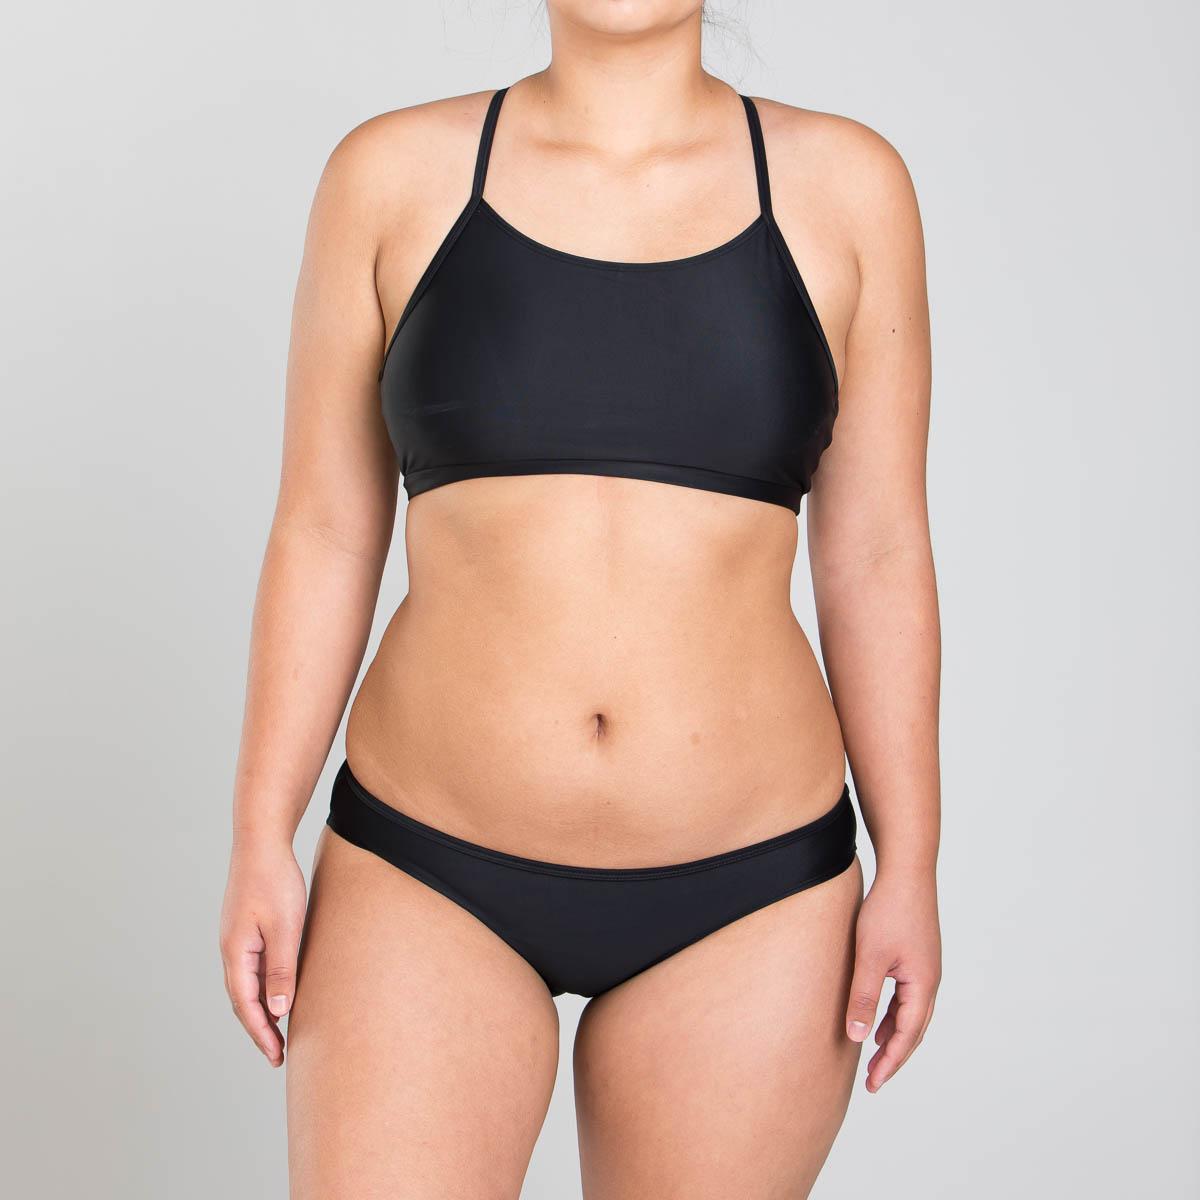 Bikini clipart two piece swimsuit. Swim modibodi underwear